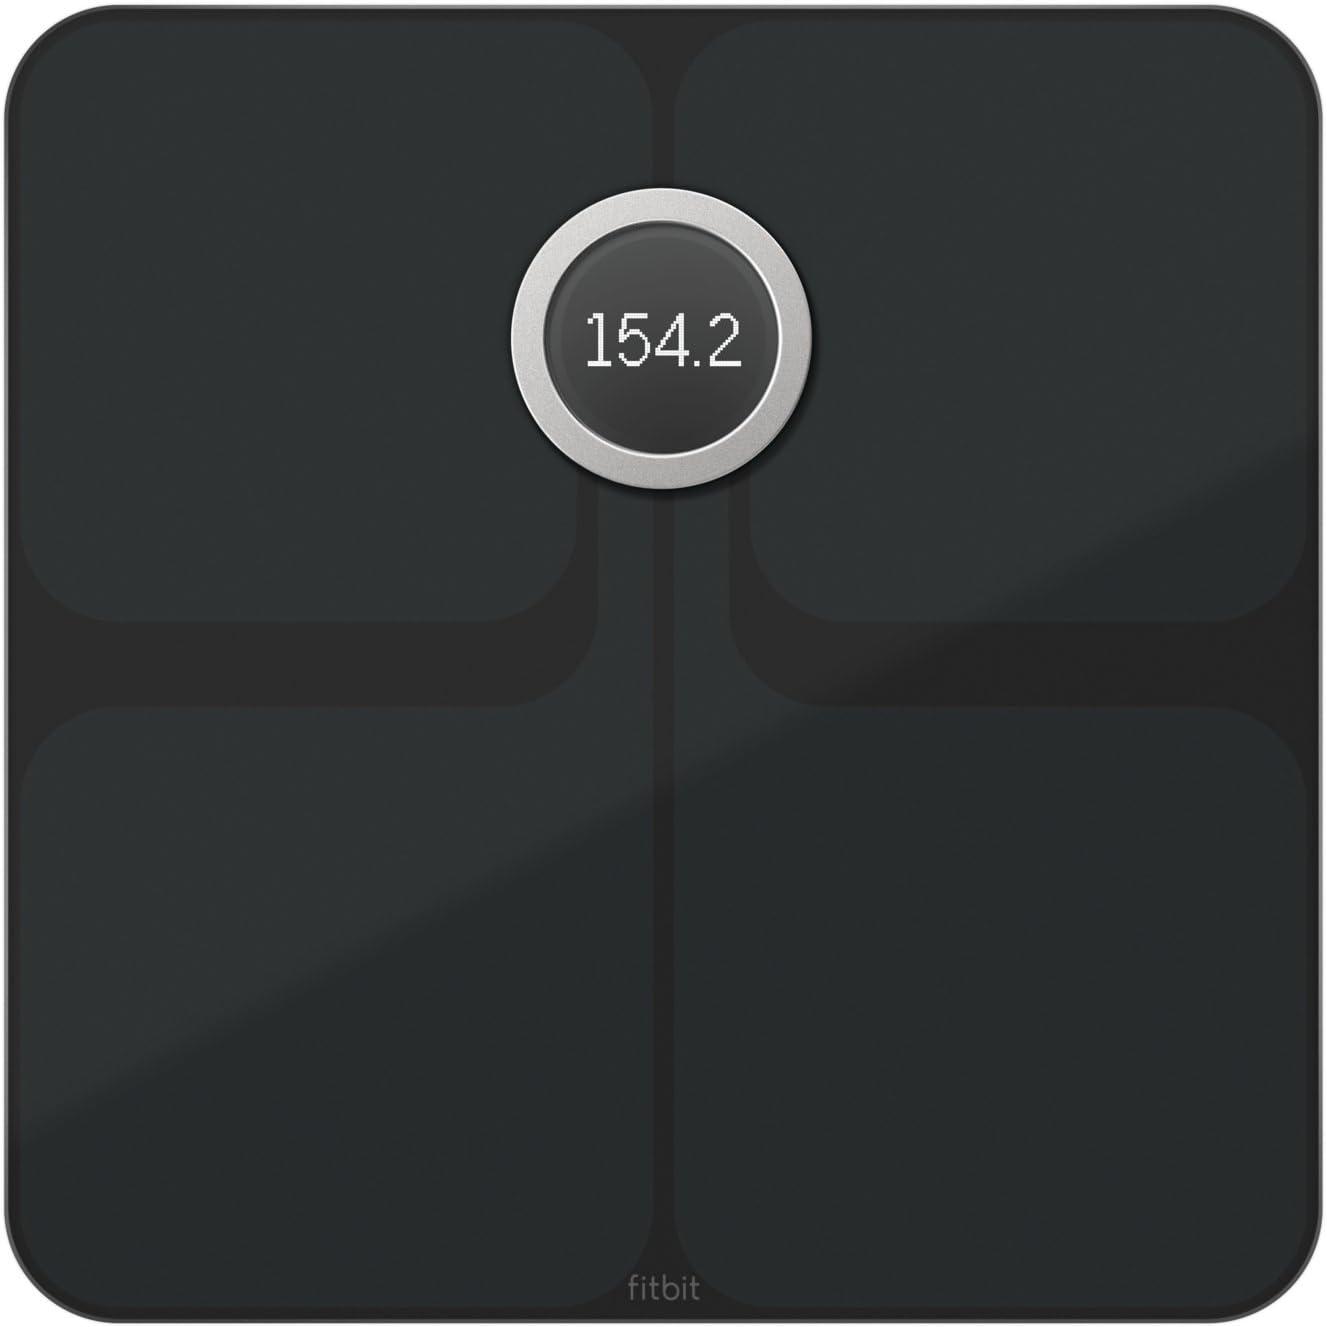 Fitbit Aria 2 Balance Wi-Fi Intelligente Compteur de Calories Mixte Adulte